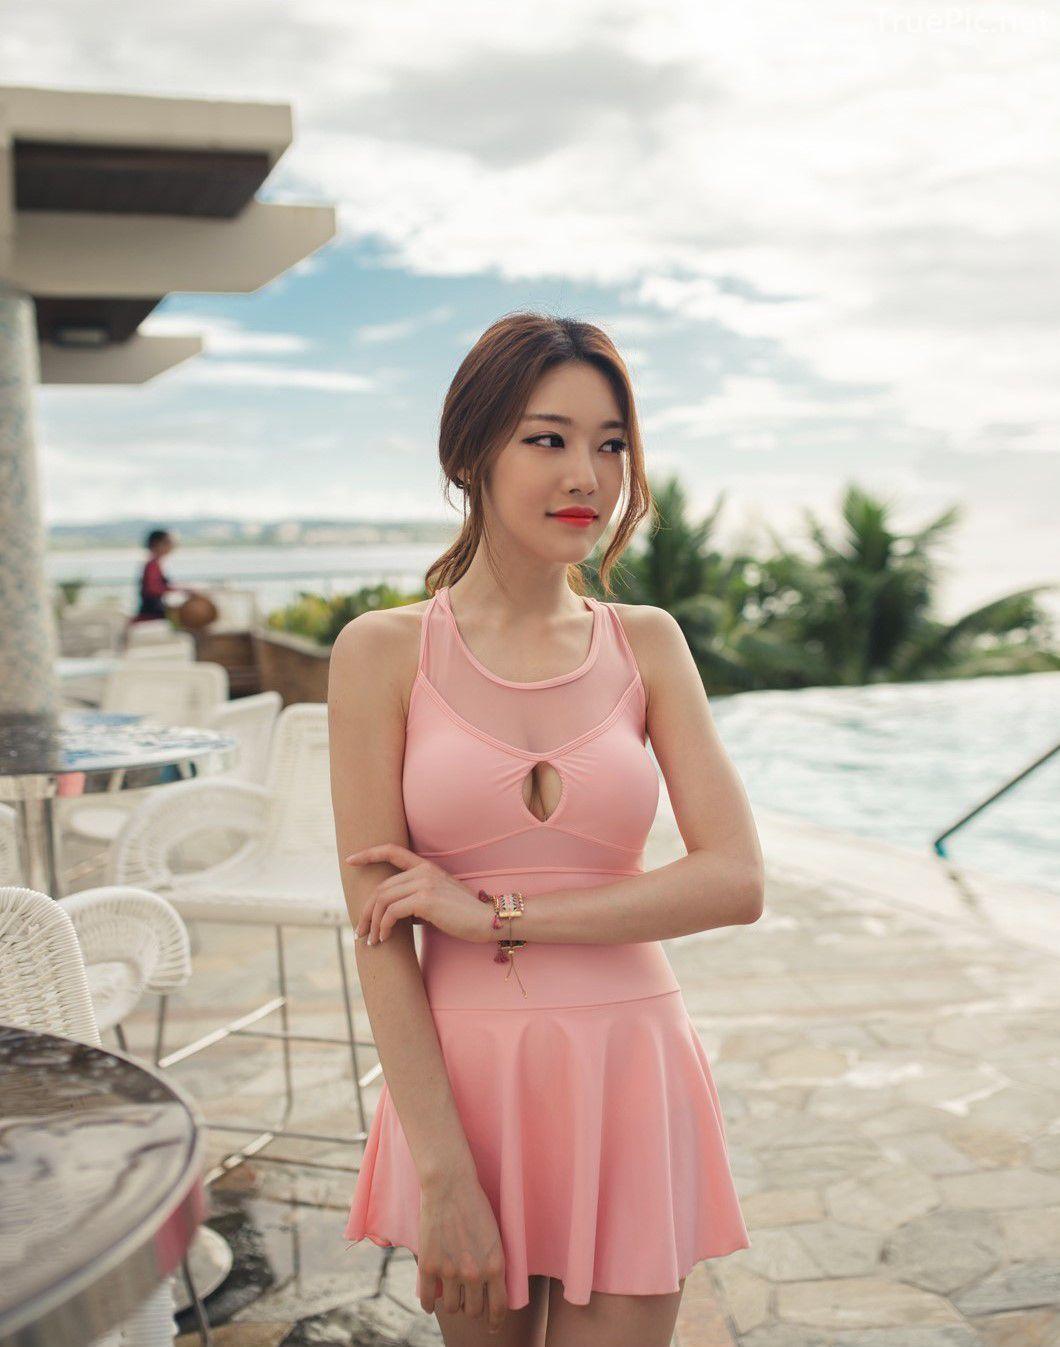 Korean model fashion - Park Jeong Yoon - Amanda One Piece Swimsuit - Picture 1